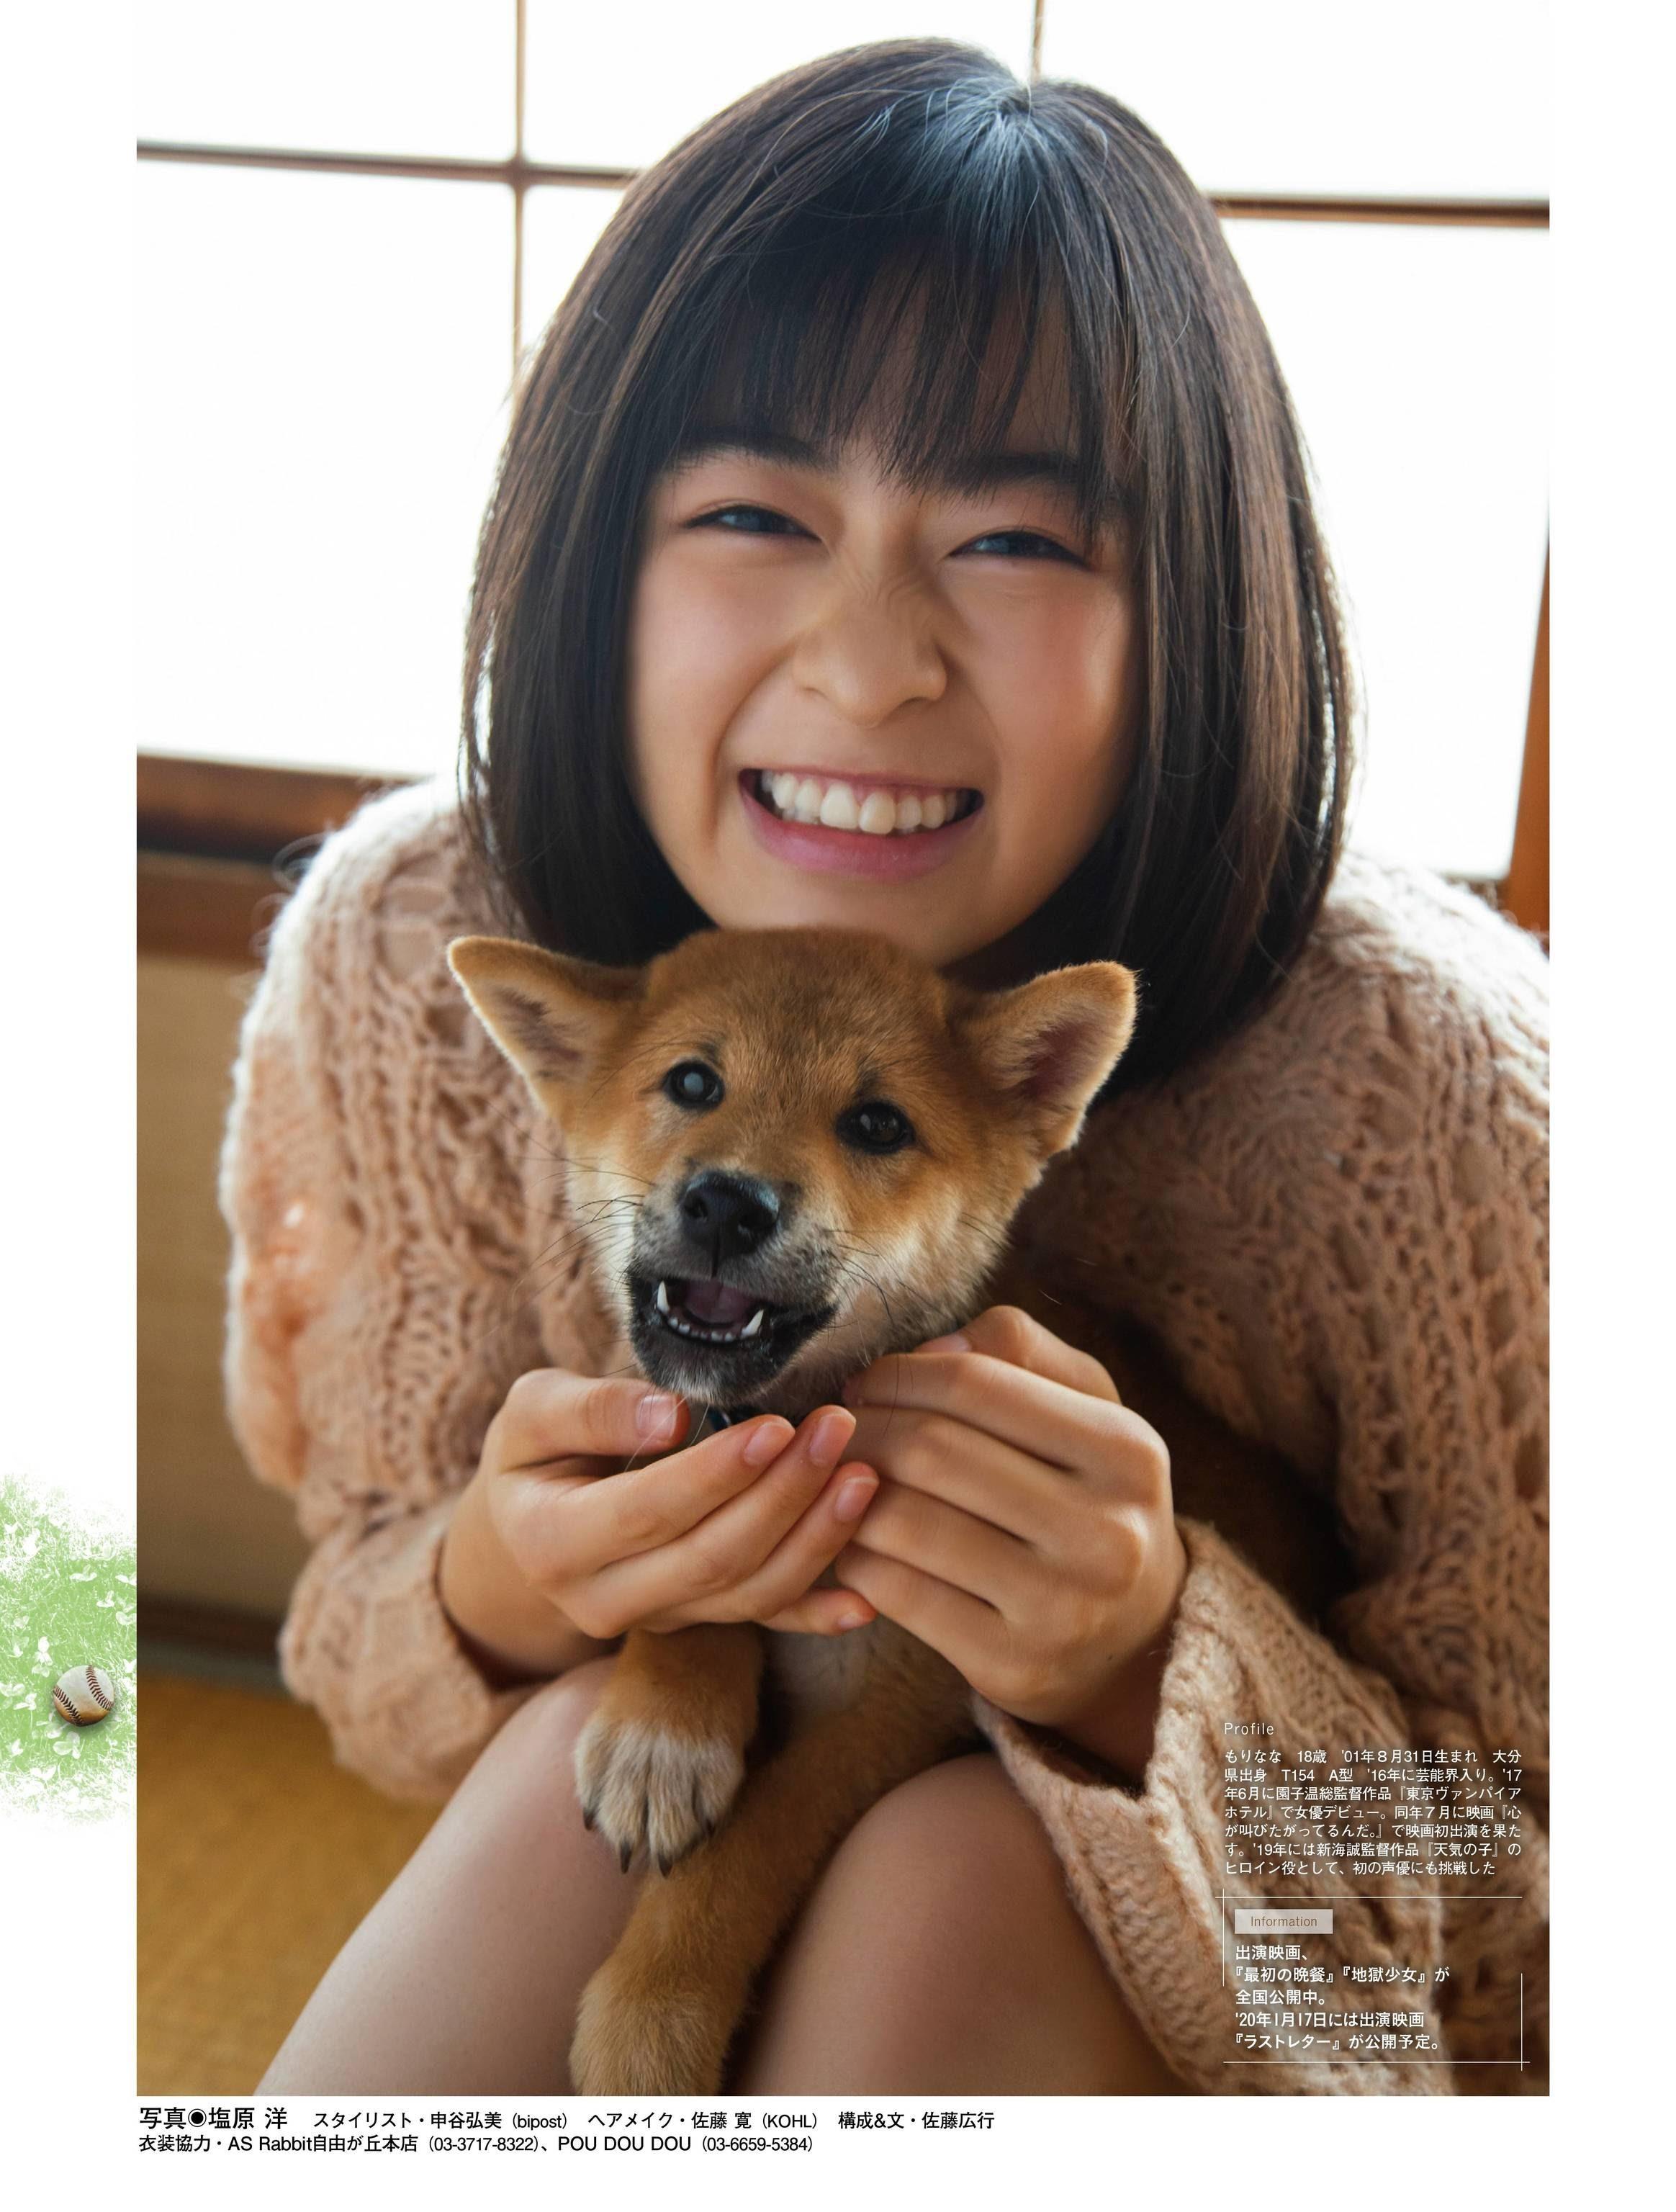 13-Nana Mori (8)